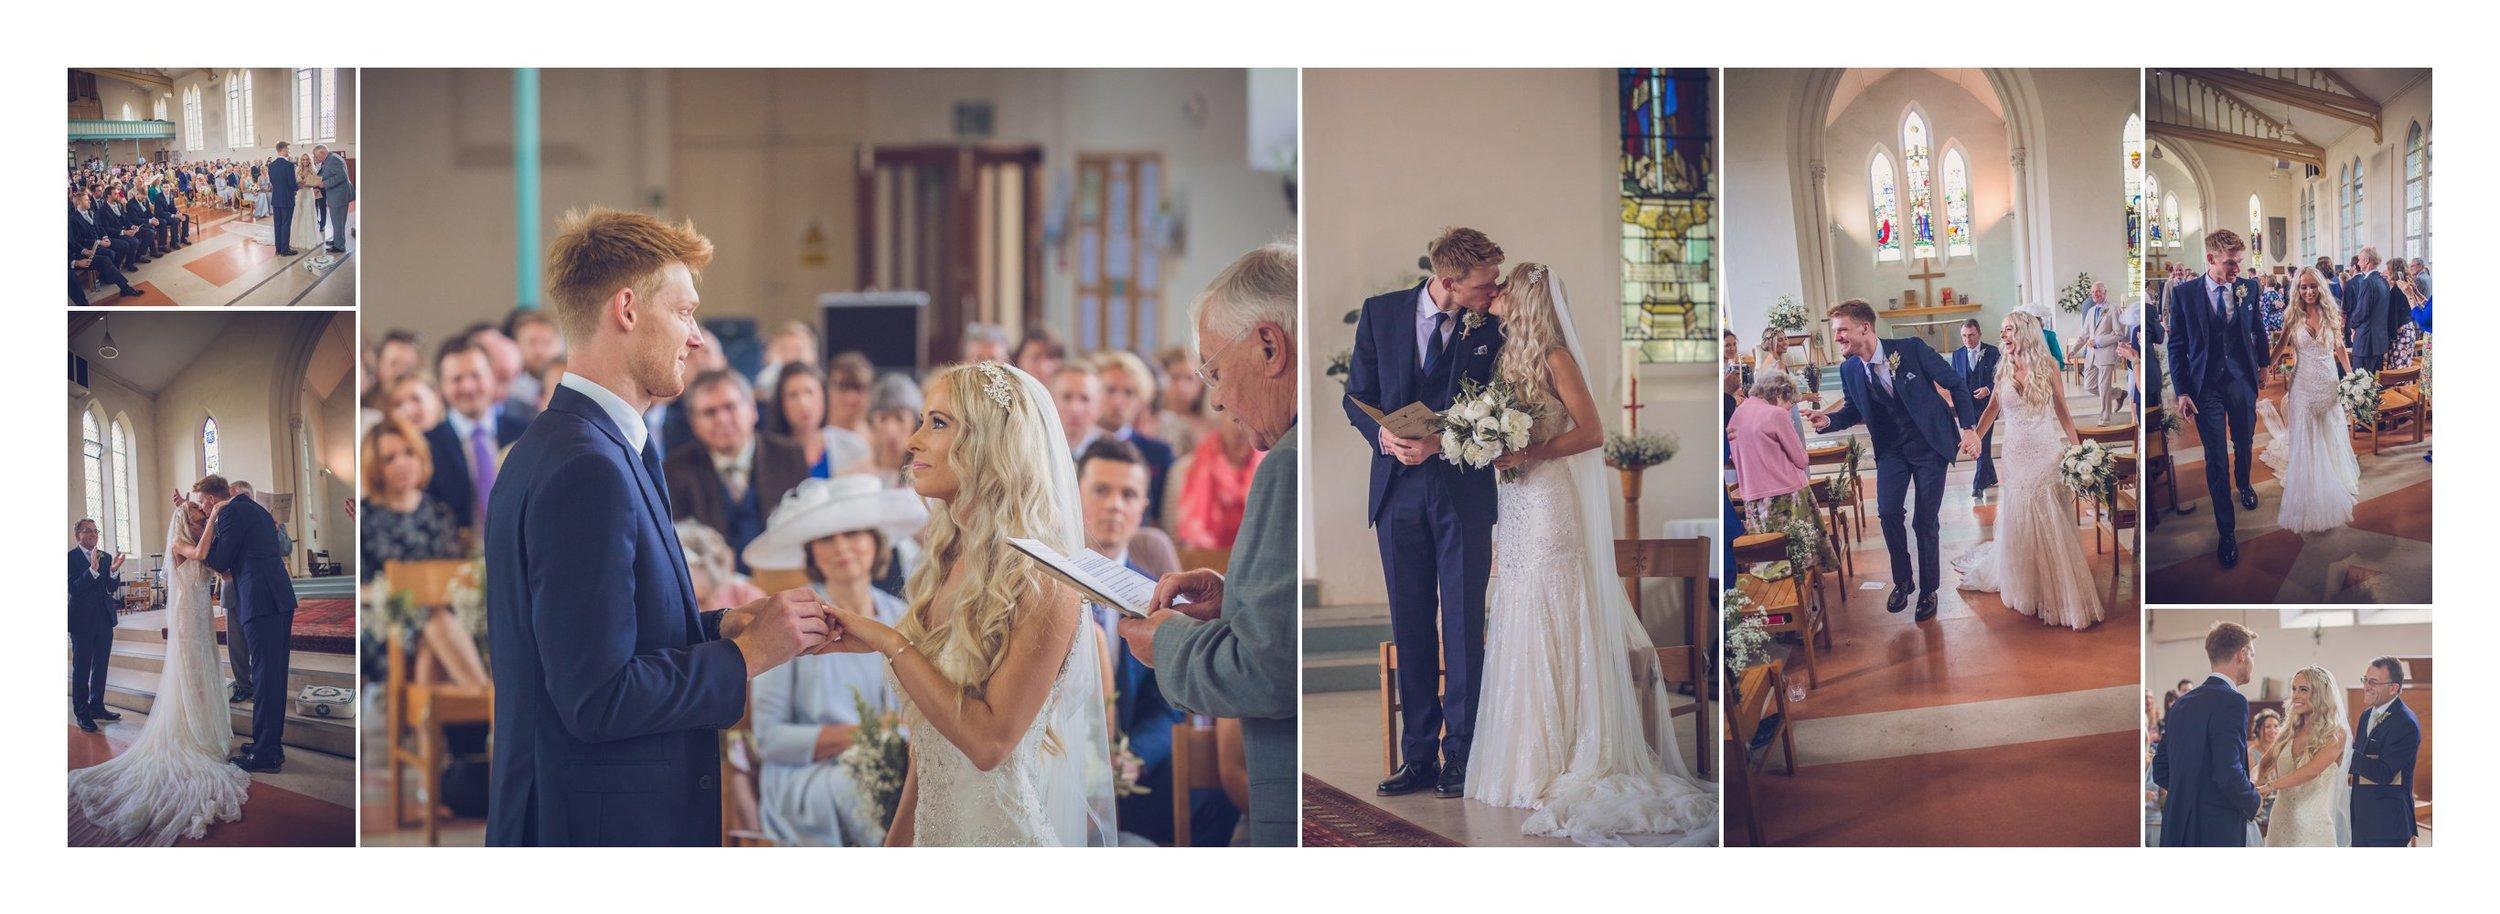 church wedding ceremony st pauls chichester.jpg